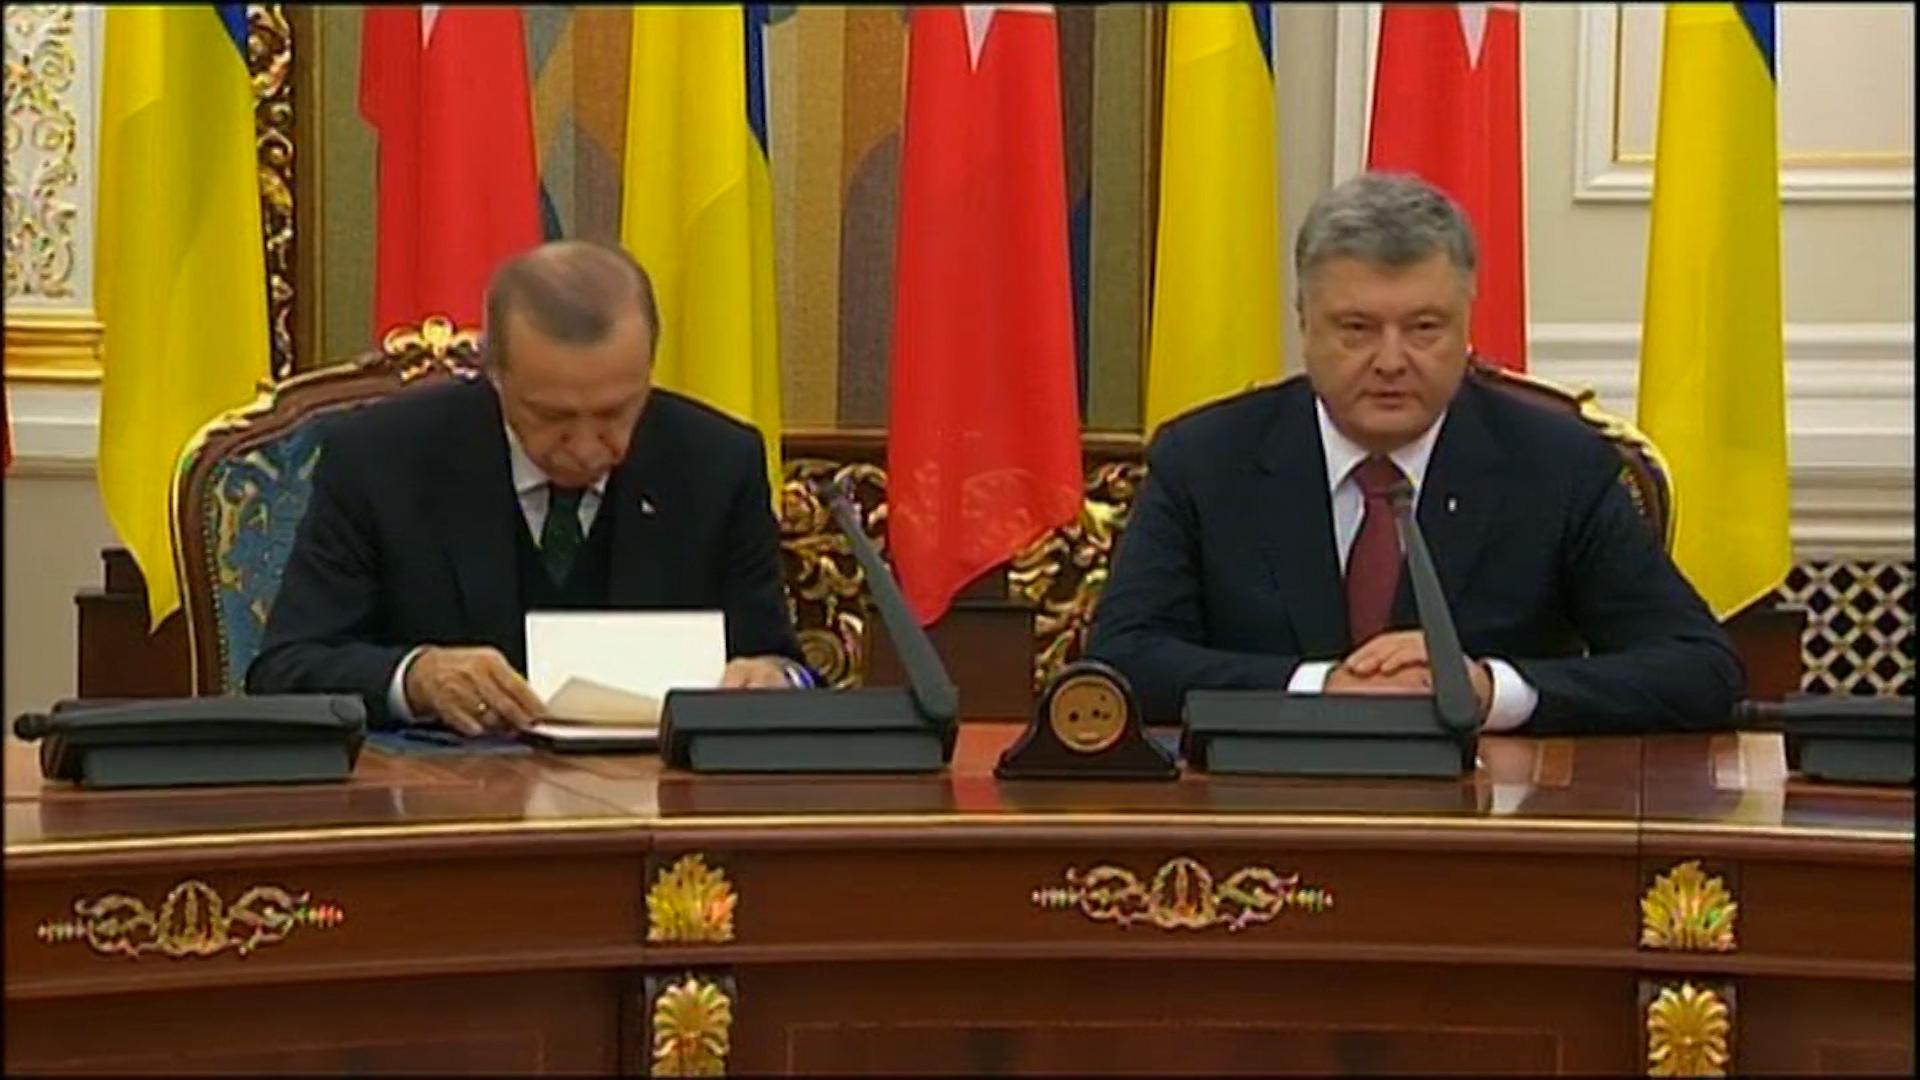 Erdogan Valt In Slaap Tijdens Persbriefing Met Oekraïense